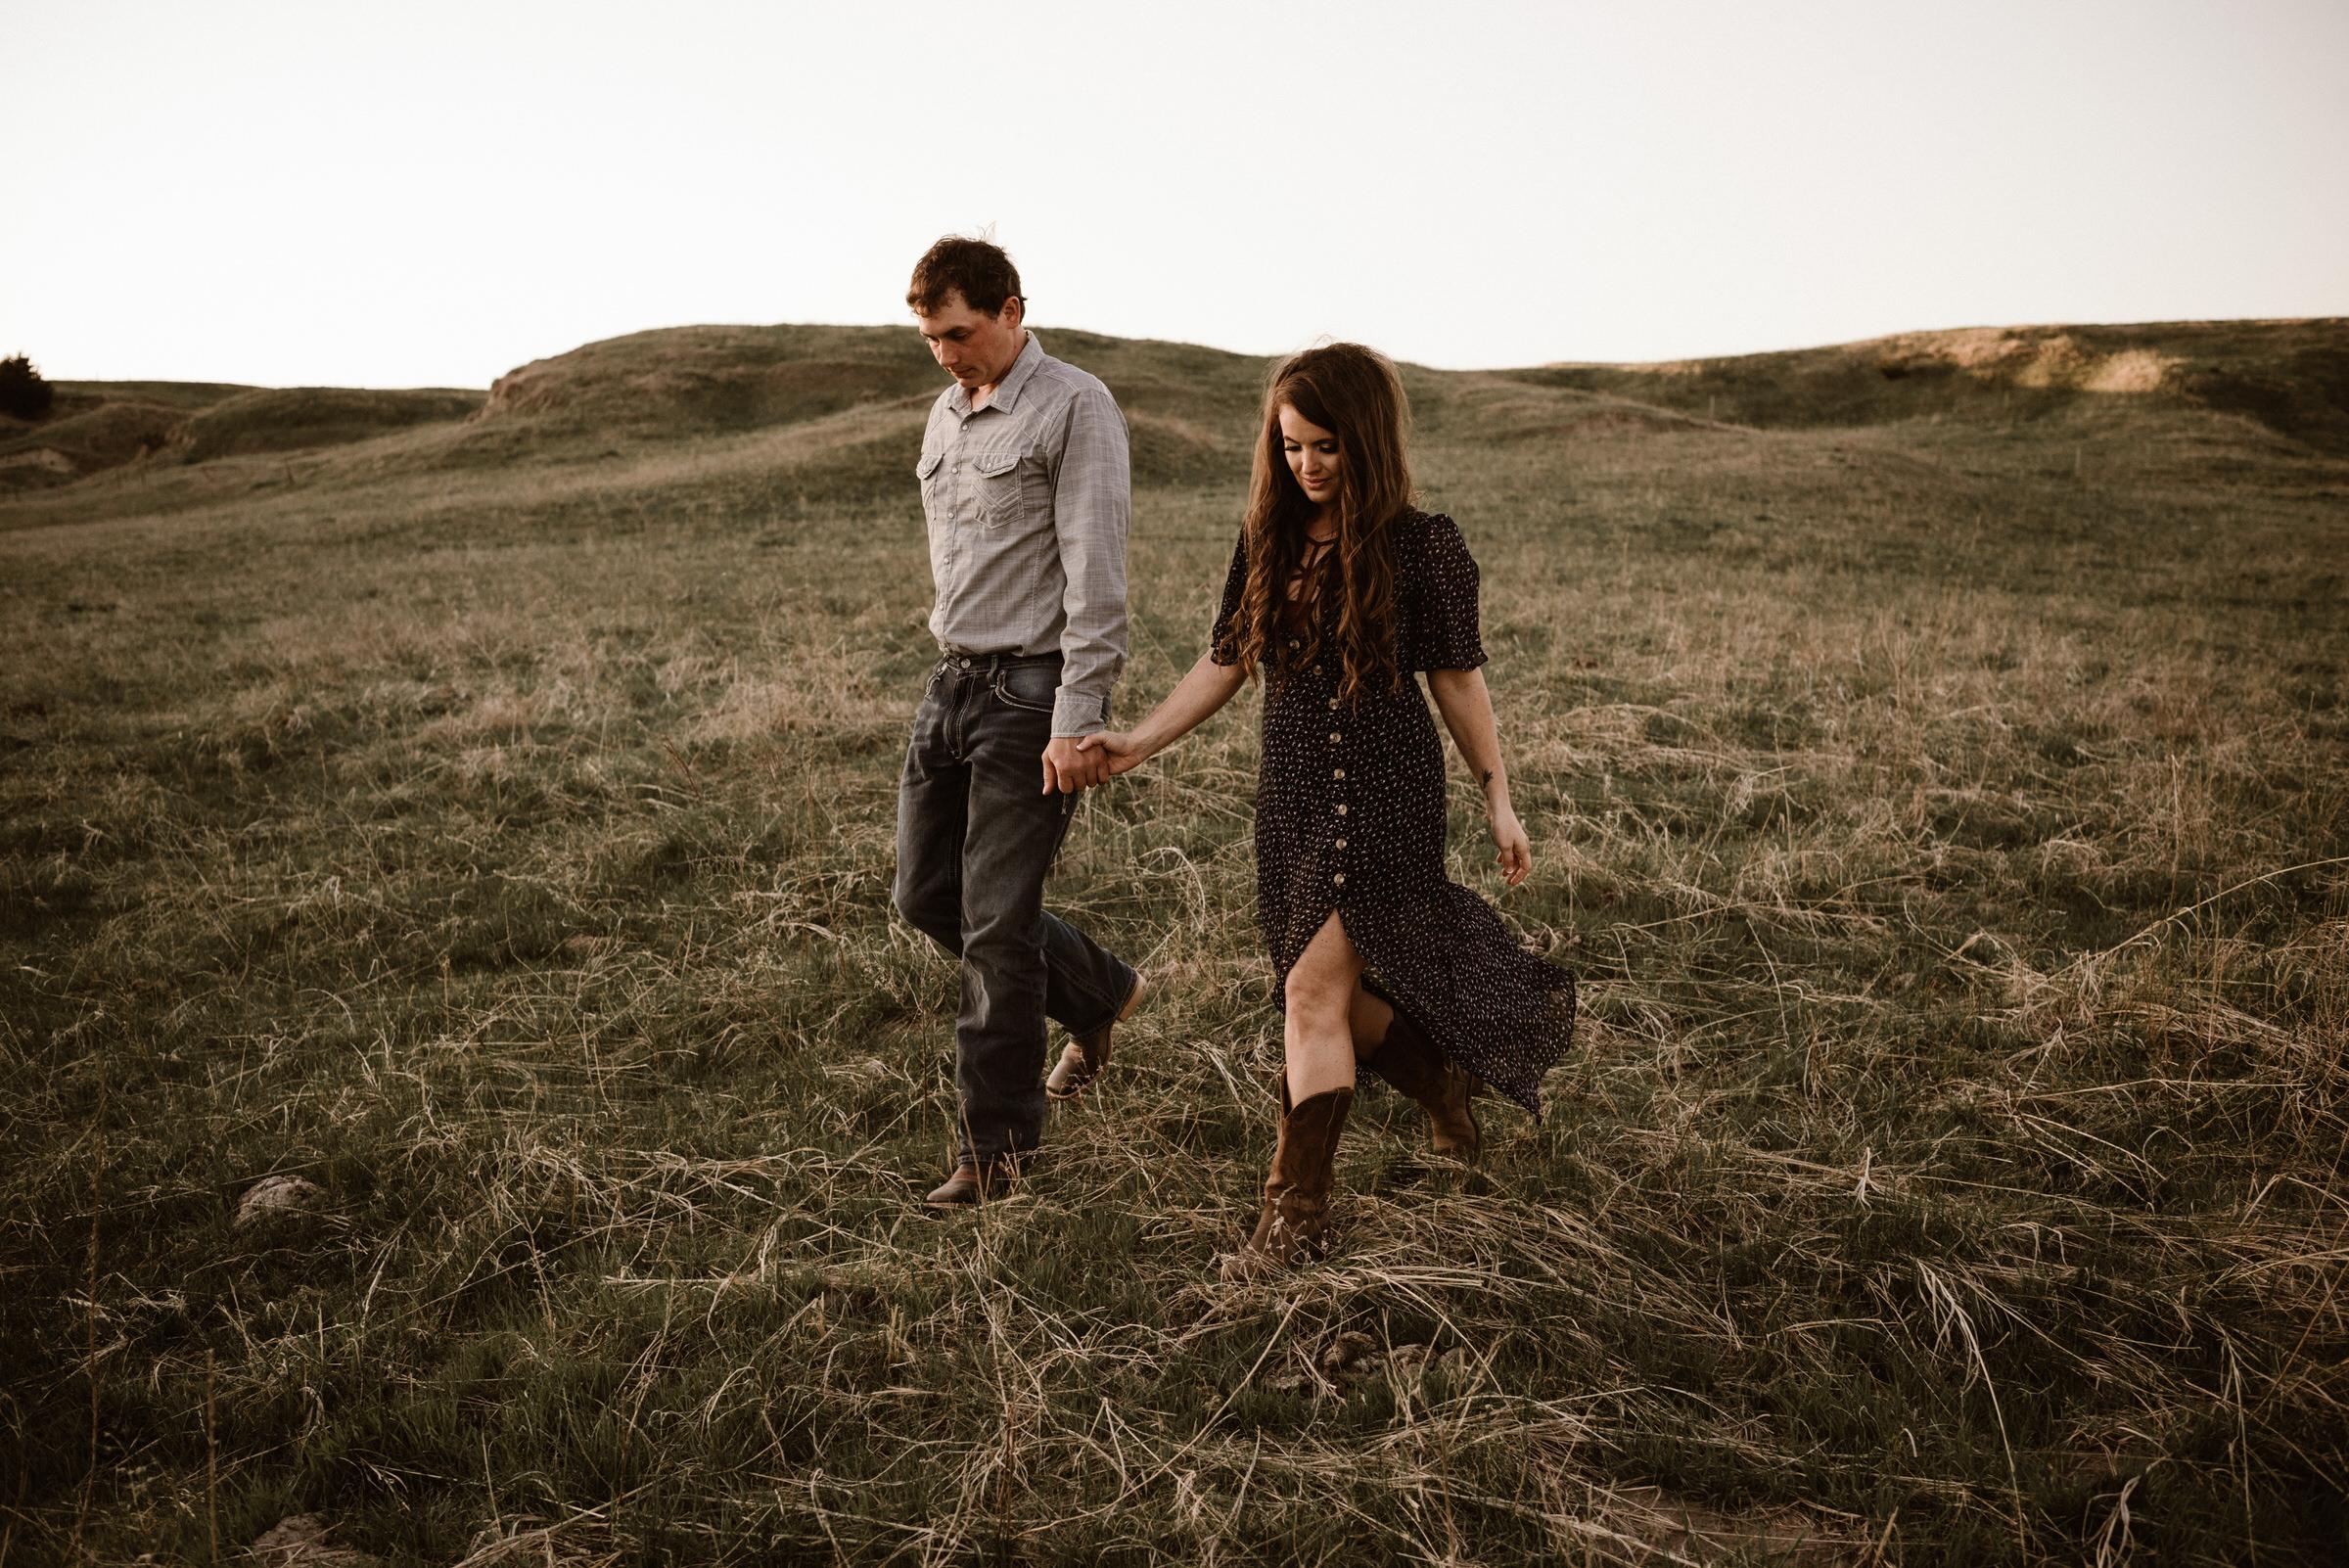 Sandhills-Nebraska-Engagement-Wedding-Photographer-Kaylie-Sirek-Photography-019.jpg